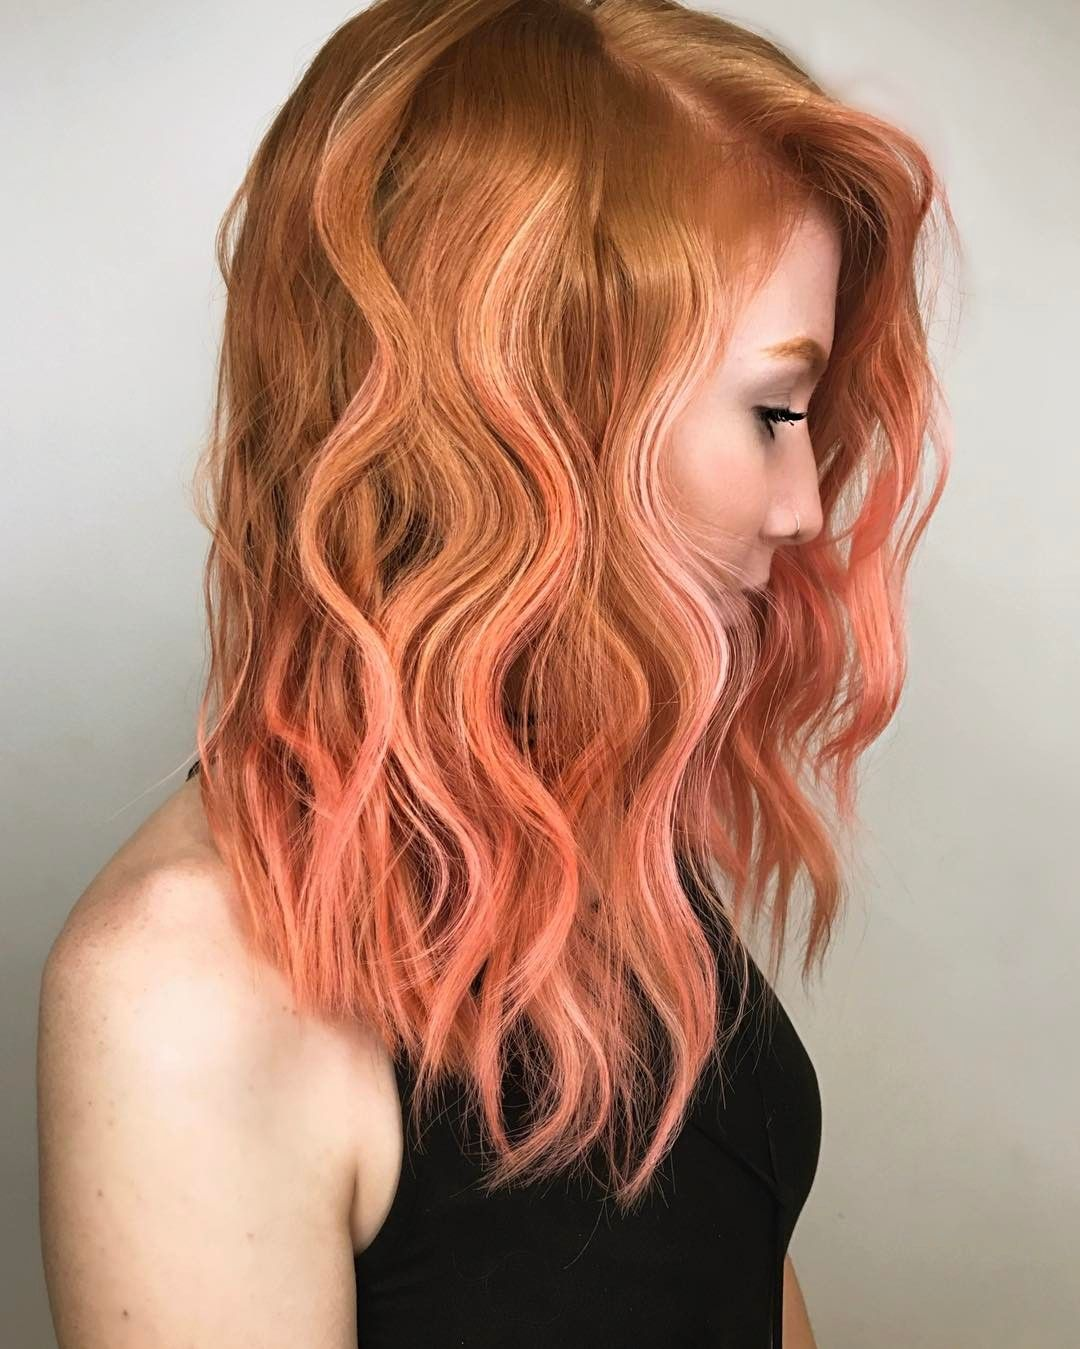 Hair Vegas (shelleygregoryhair) • Instagram photos and